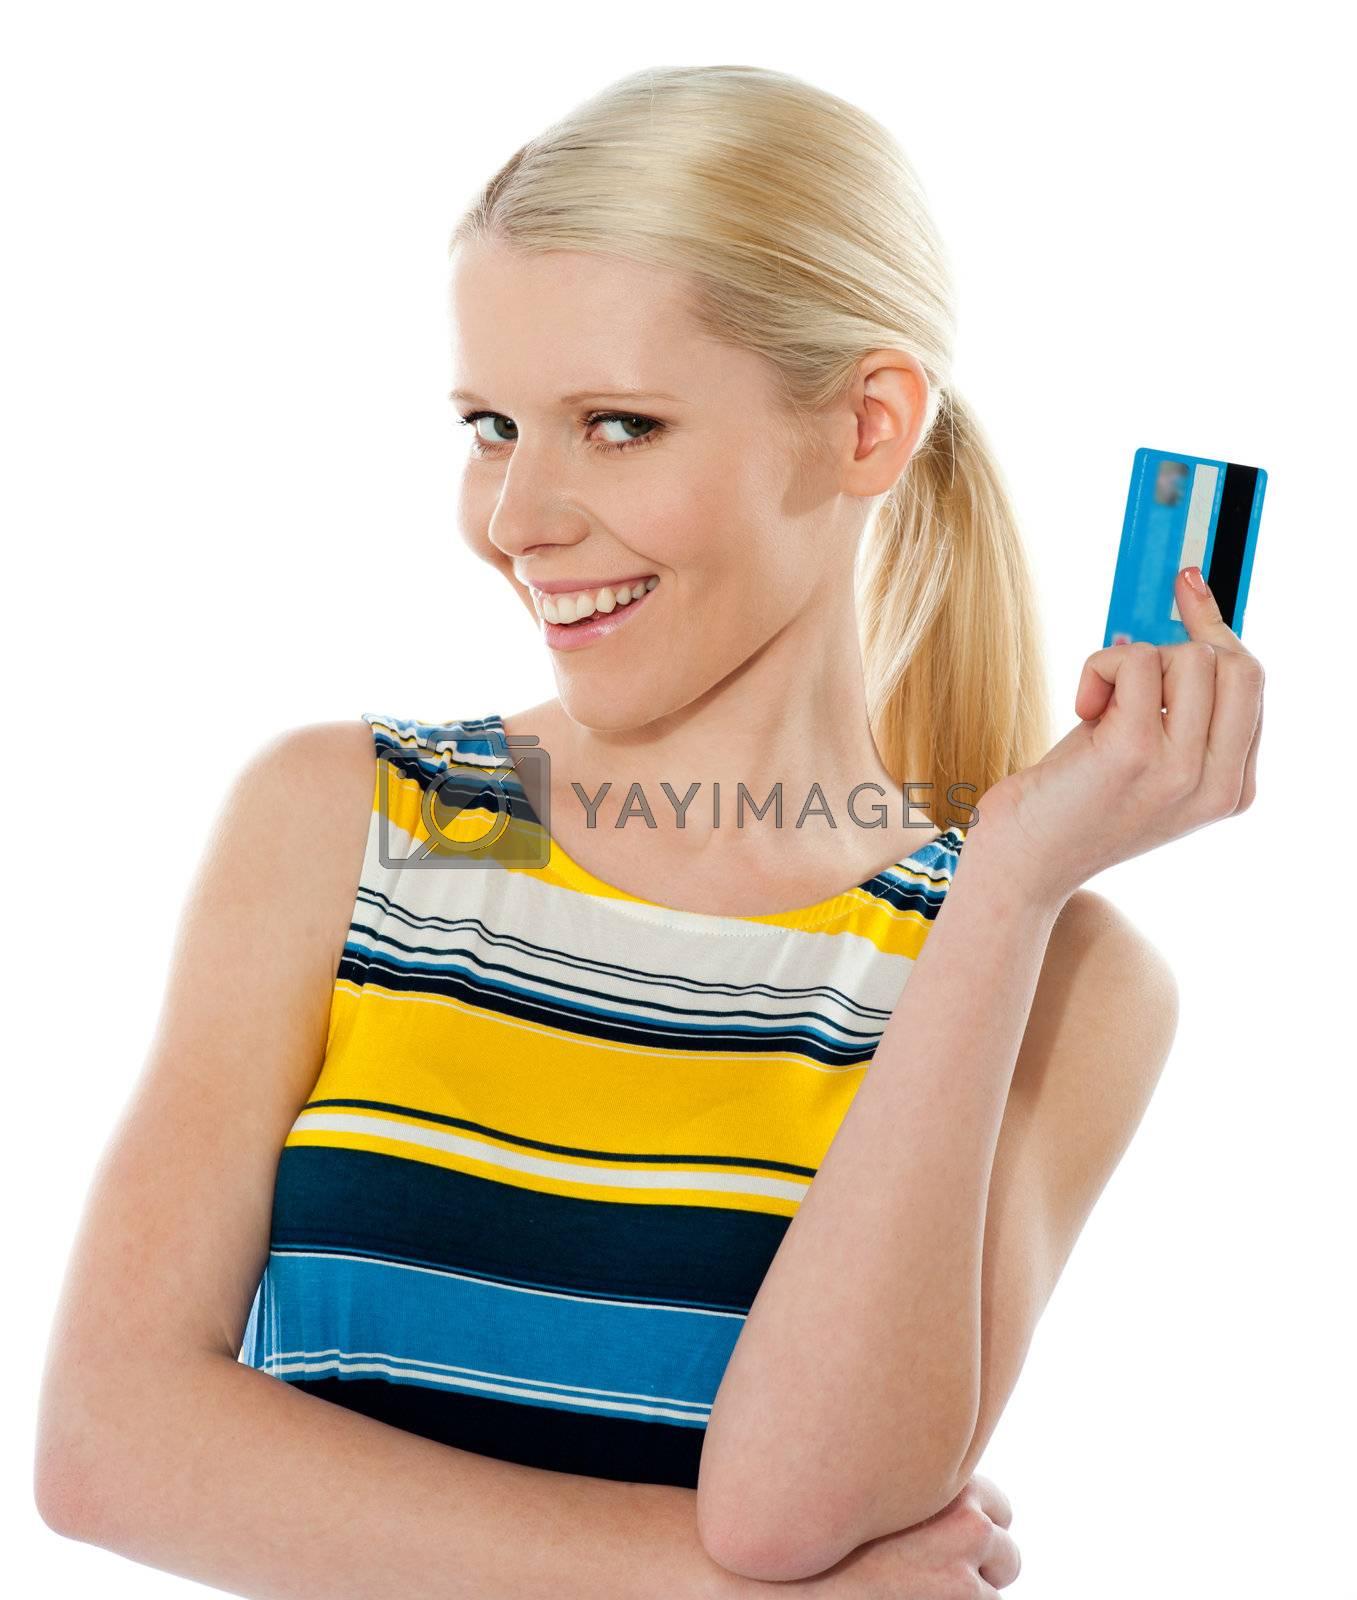 Blond salesgirl posing with credit card and smiling at camera